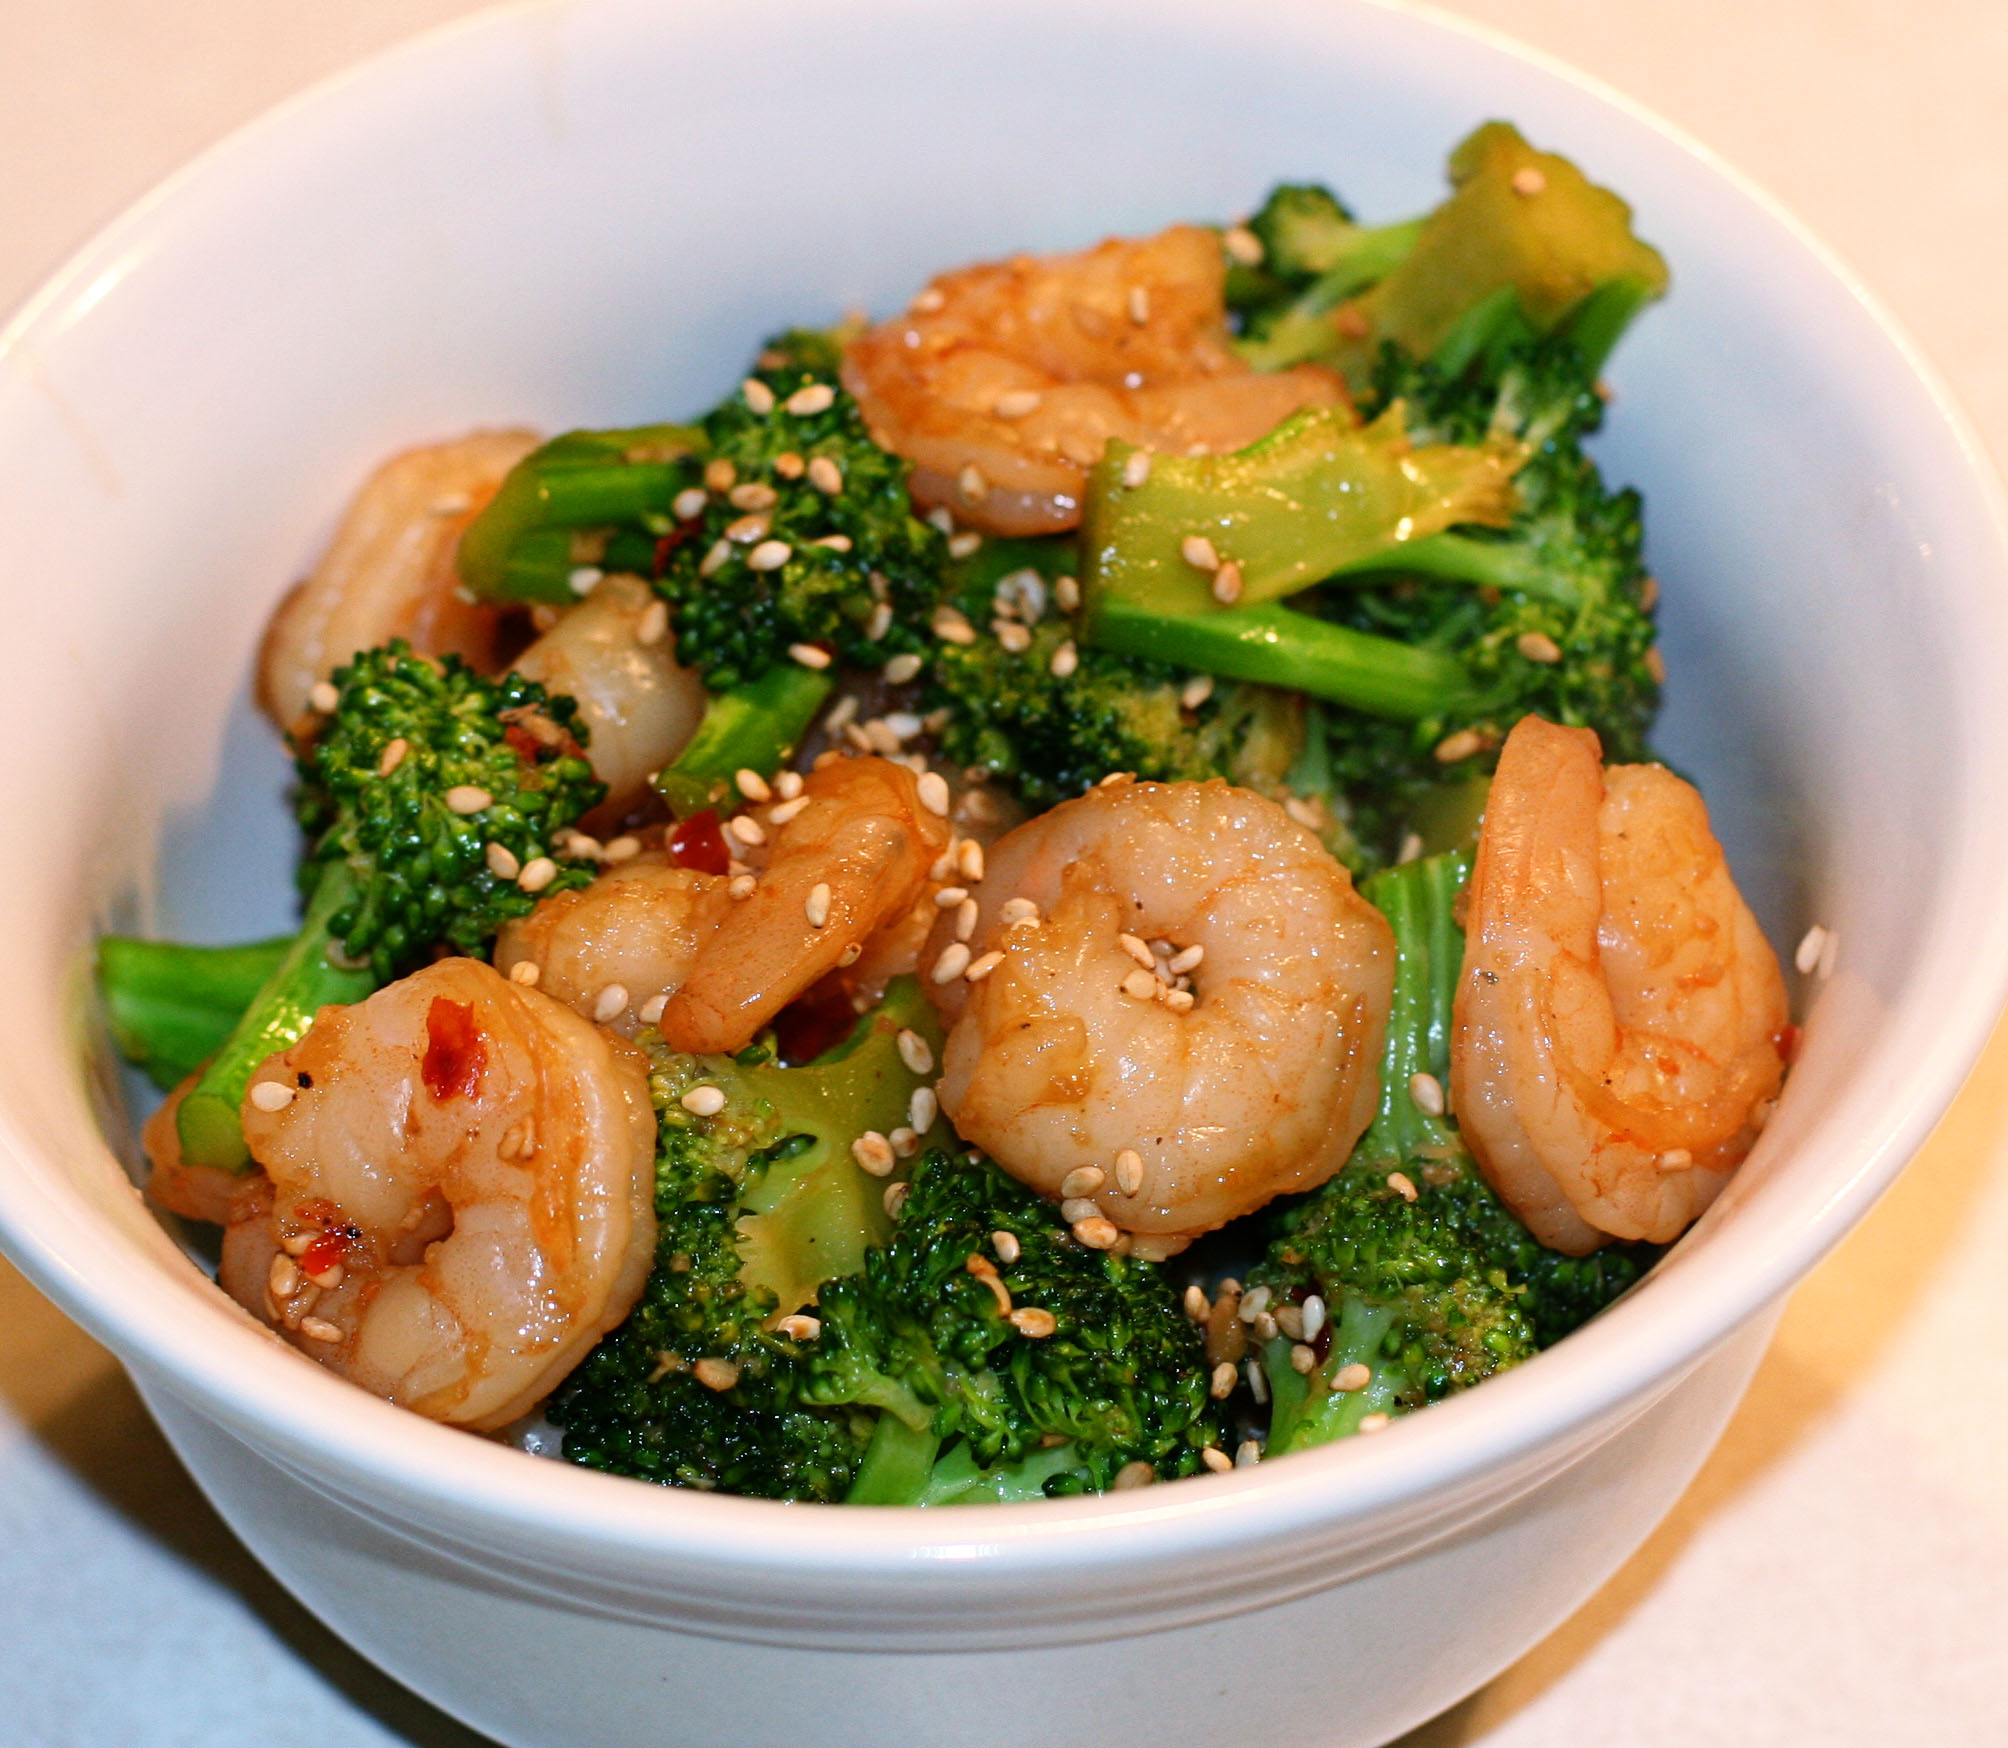 Sesame shrimp and broccoli tasty kitchen a happy recipe community forumfinder Gallery